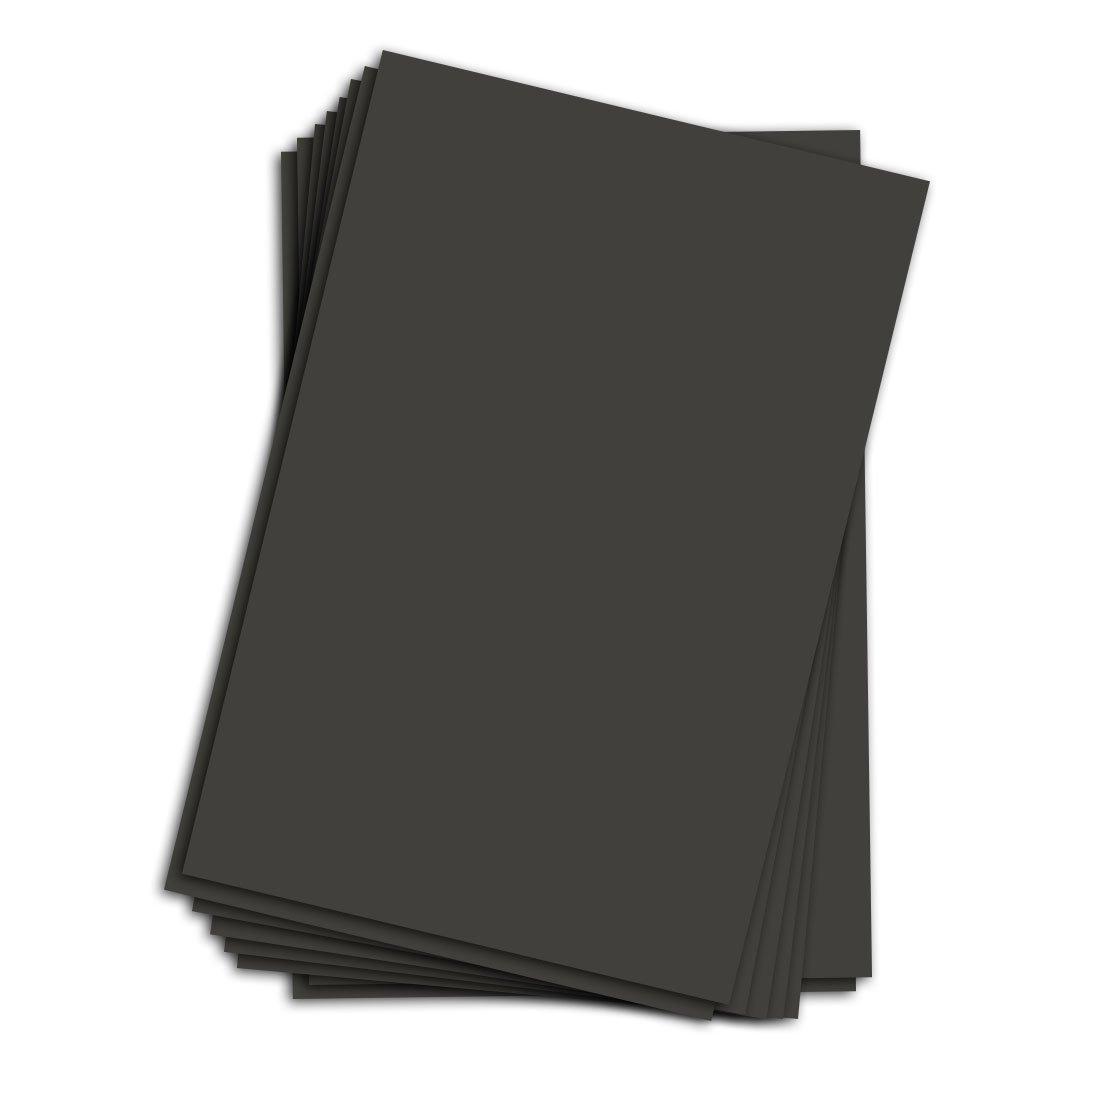 11'' X 17'' Black Chipboard - Cardboard Medium Weight Chipboard Sheets - 25 Per Pack.